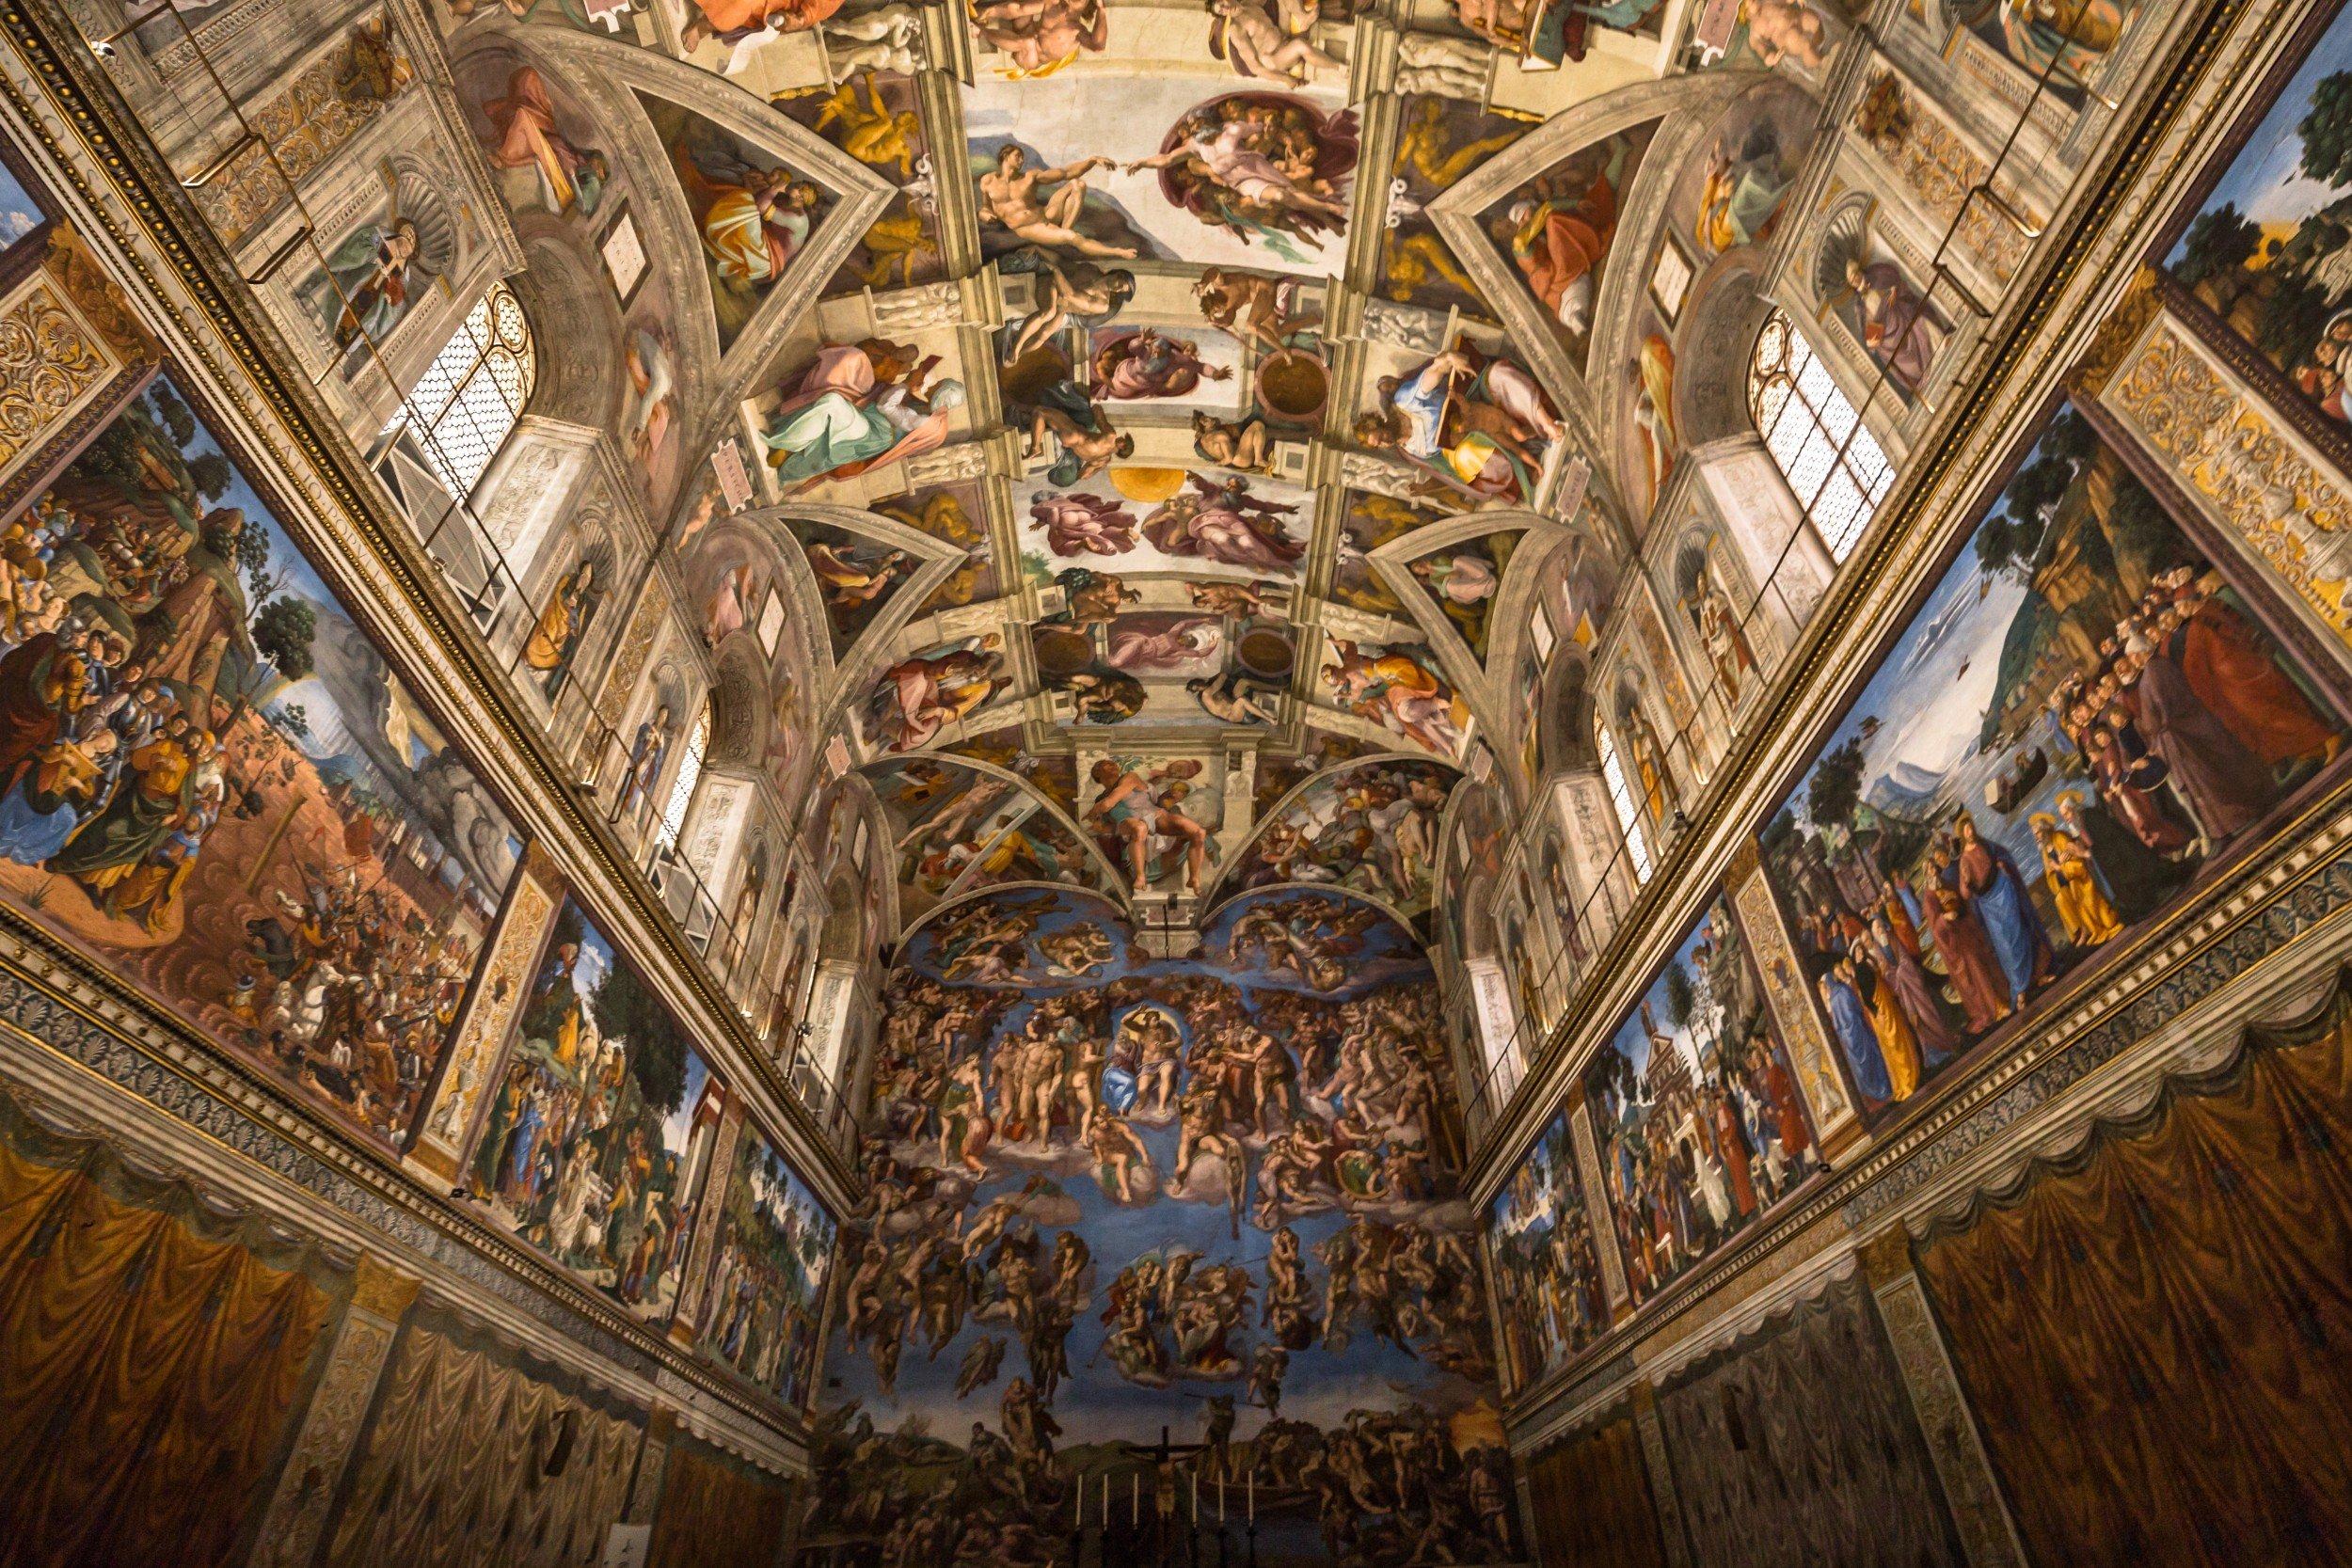 Teto Capela Sistina do Vaticano